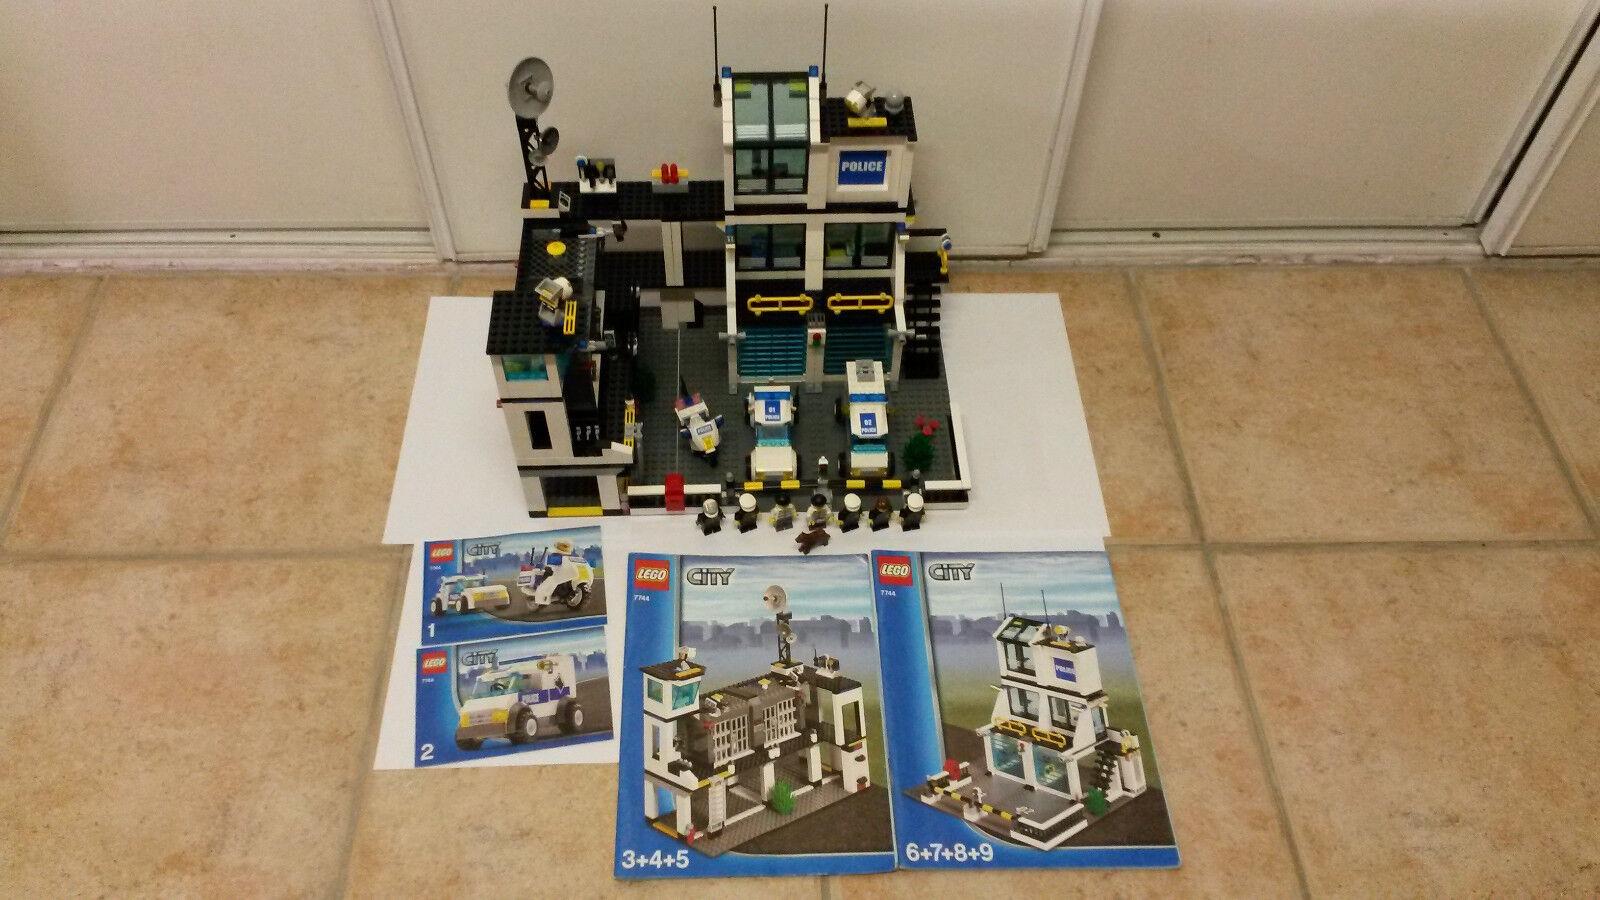 Lego city le grand commissariat de police ref 7744